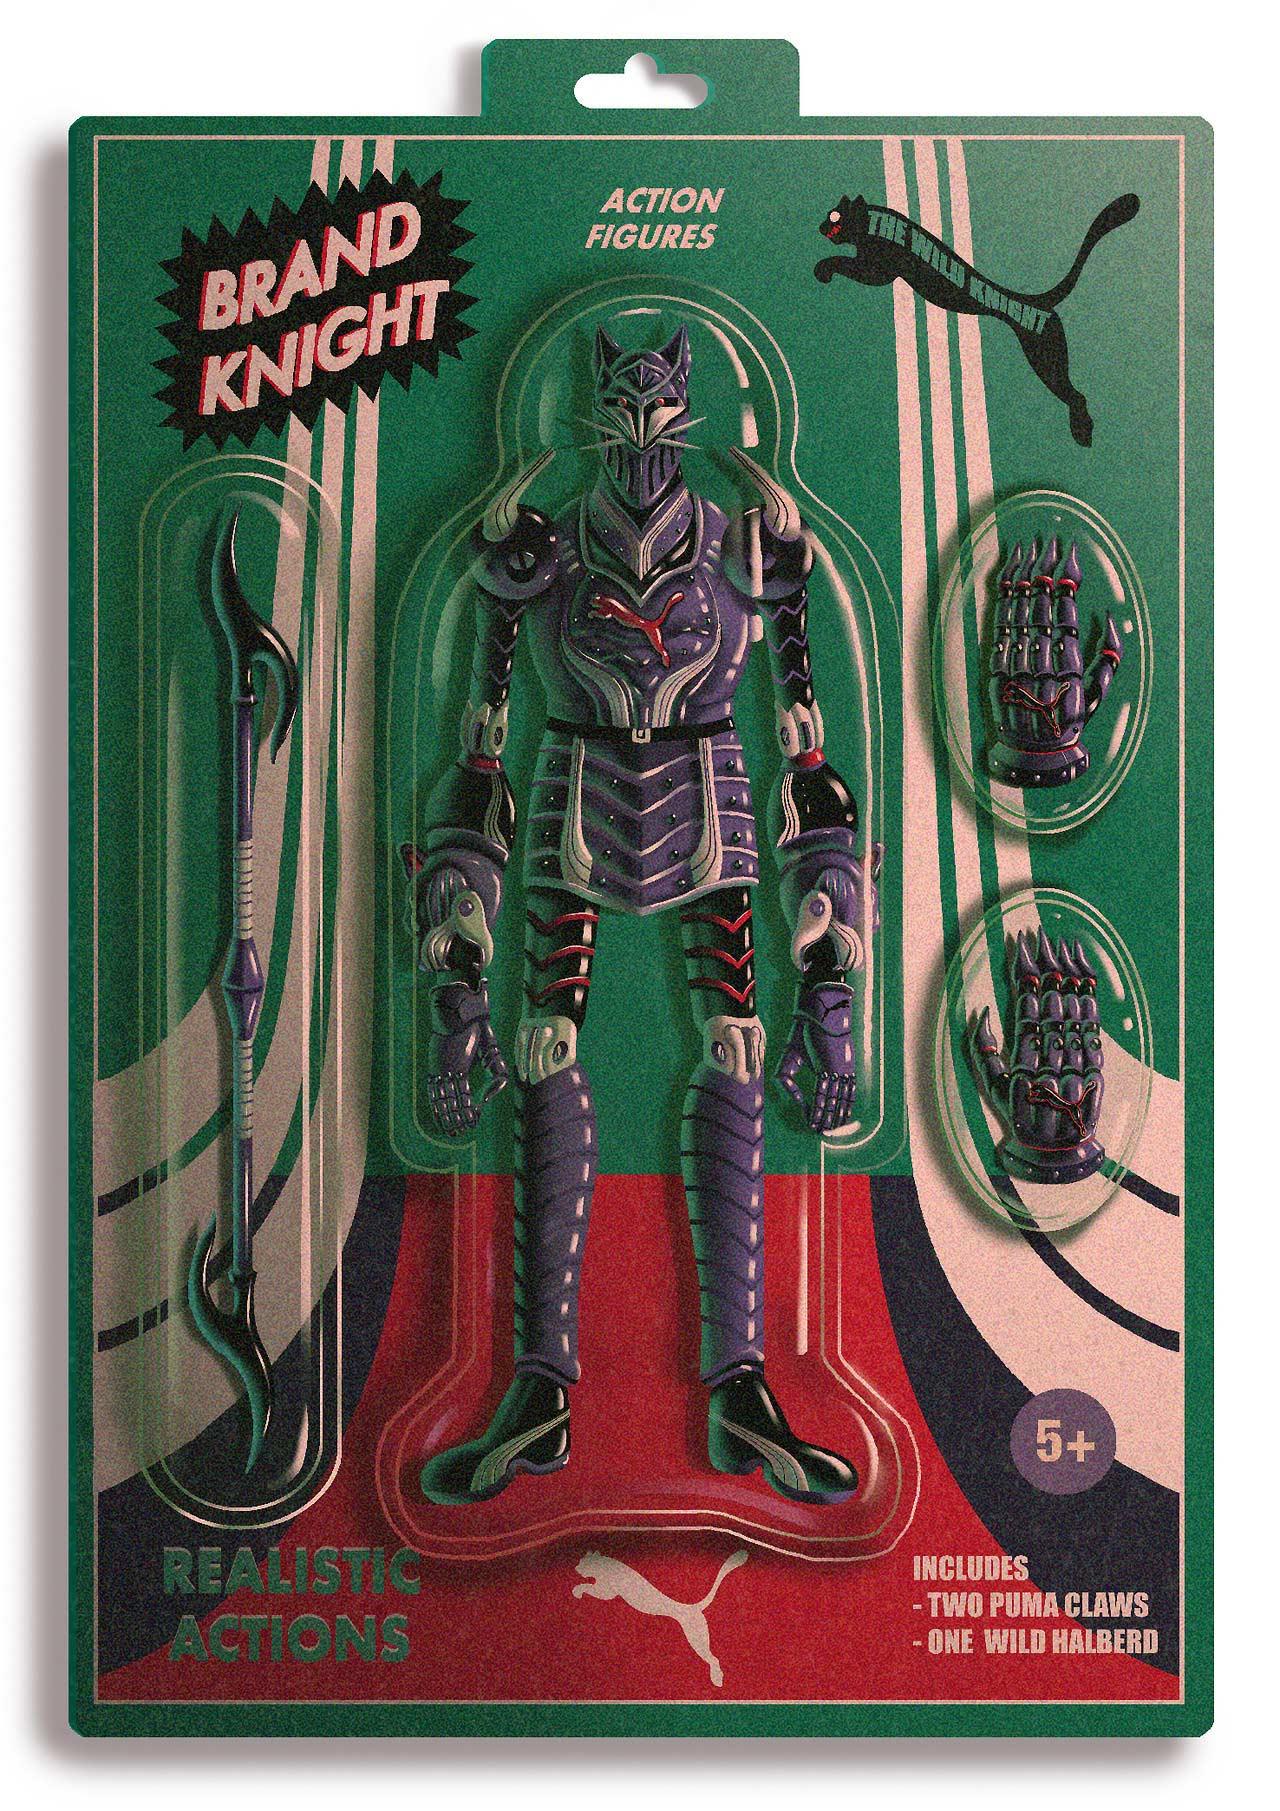 Brand Knights brand-knights_08